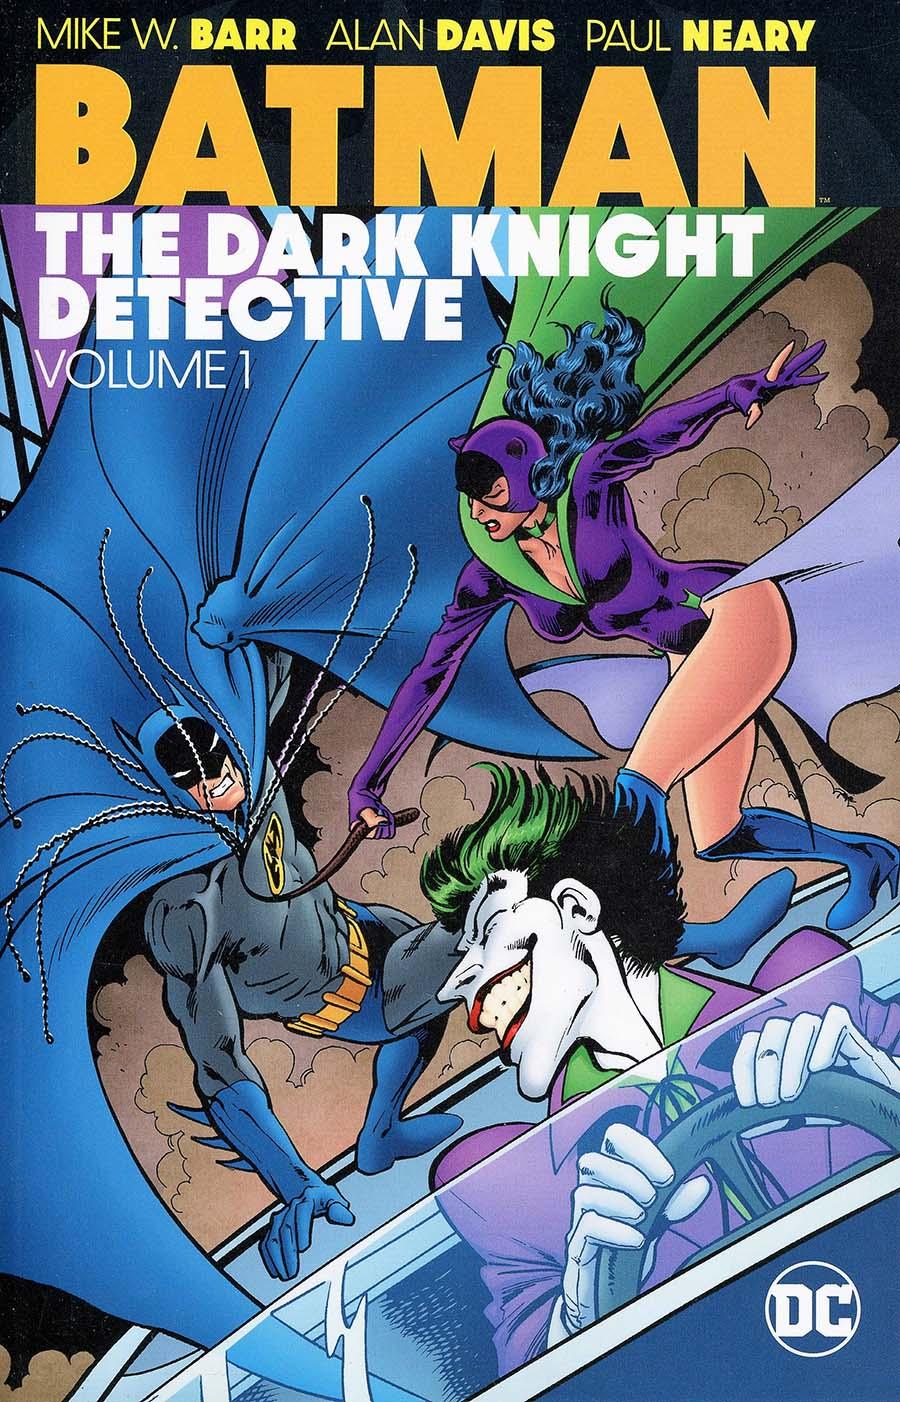 Batman The Dark Knight Detective Vol 1 TP